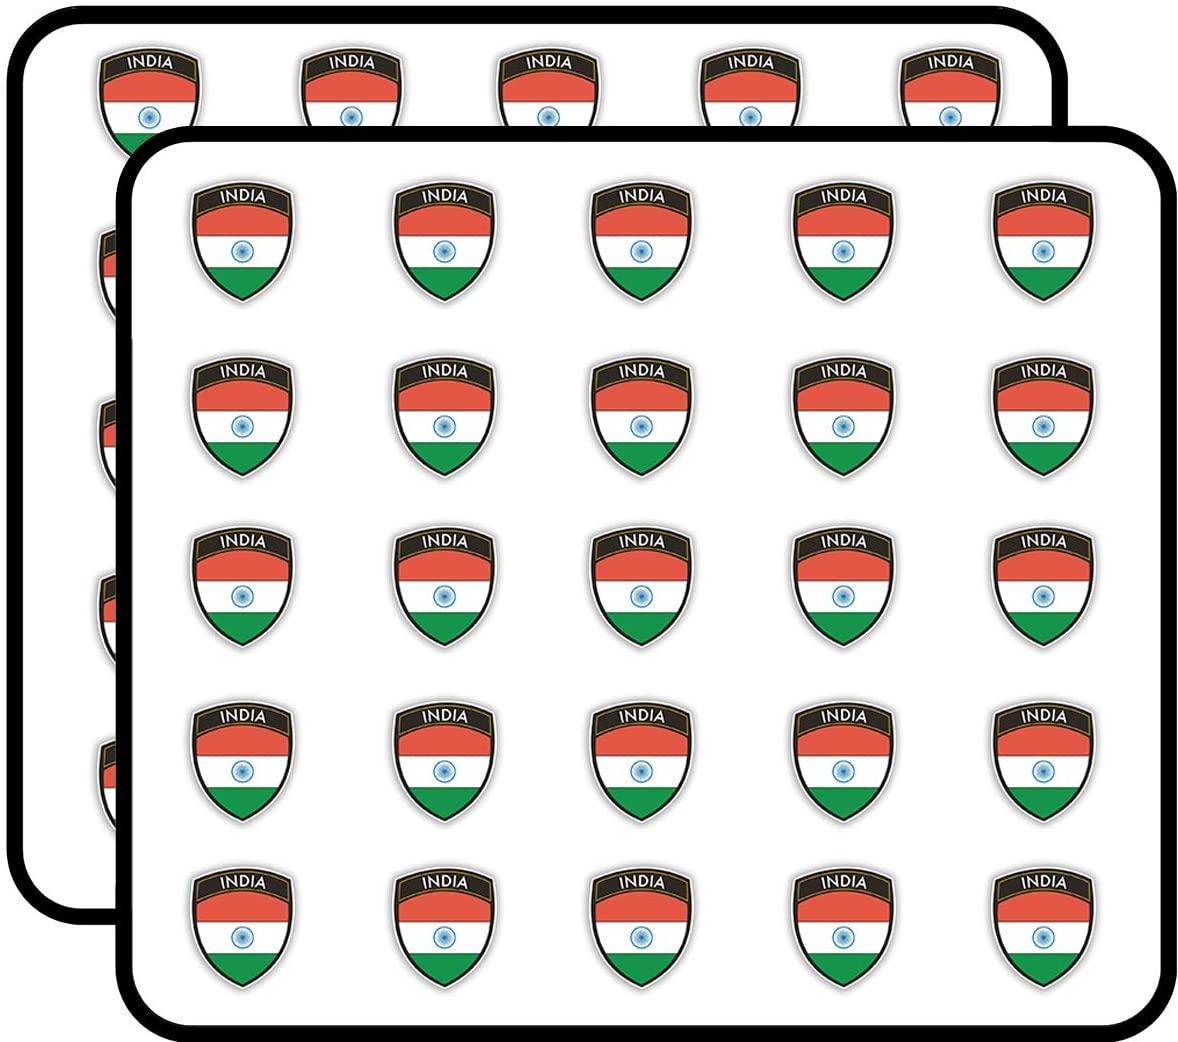 India Flag Design Sticker for Scrapbooking, Calendars, Arts, Kids DIY Crafts, Album, Bullet Journals 50 Pack